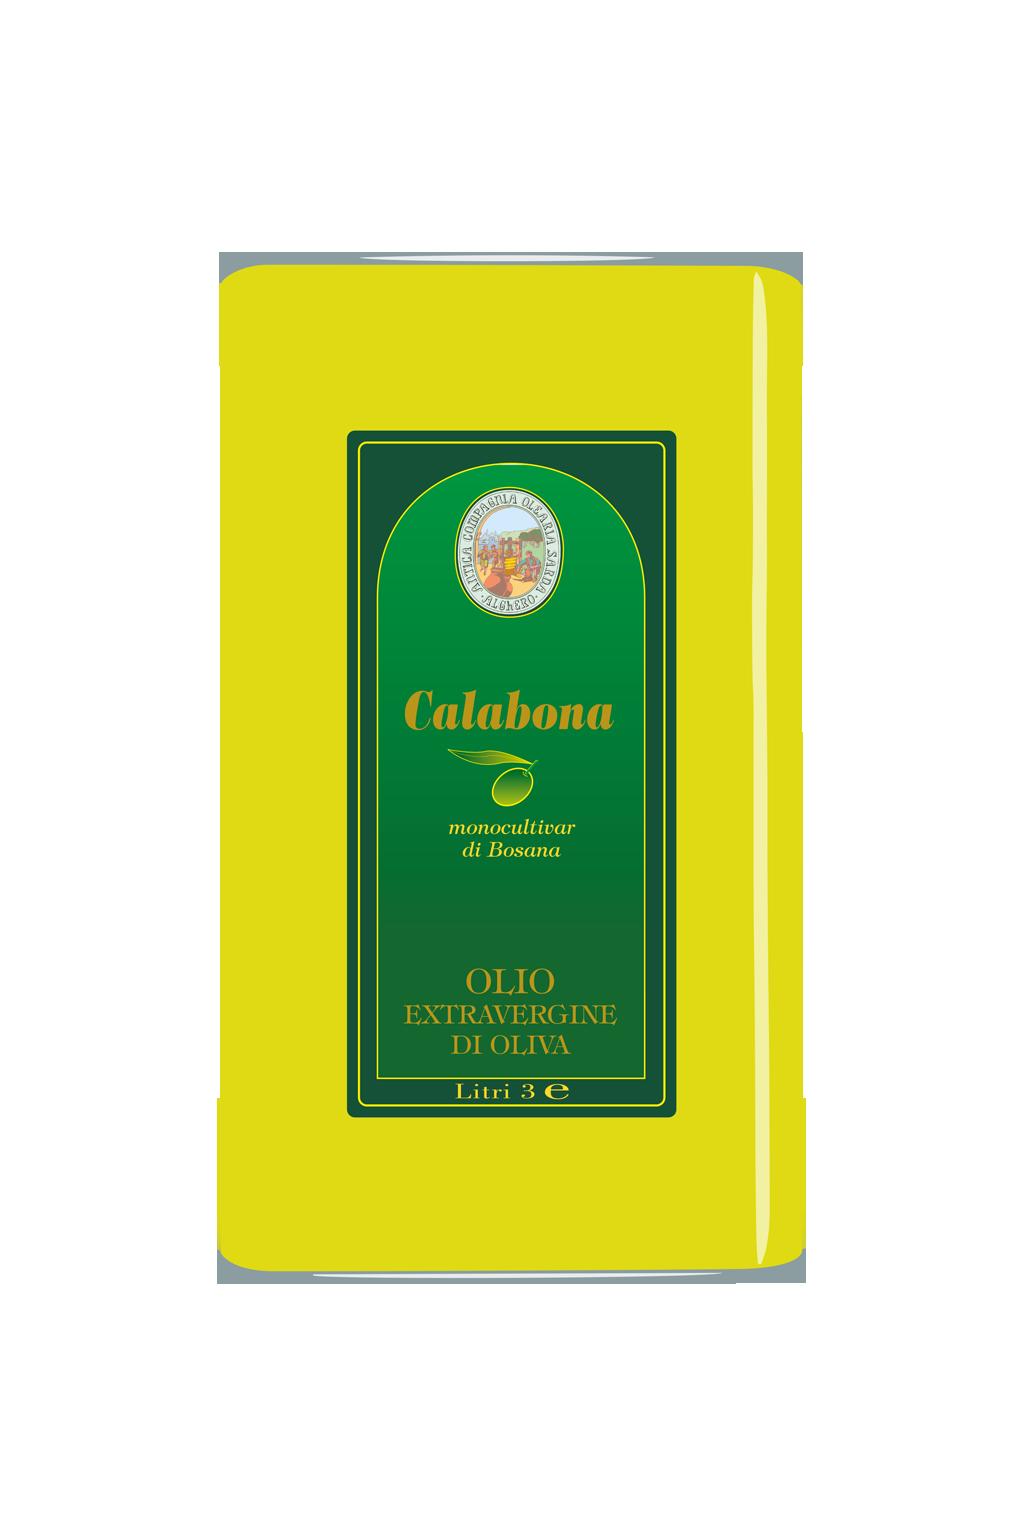 Calabona